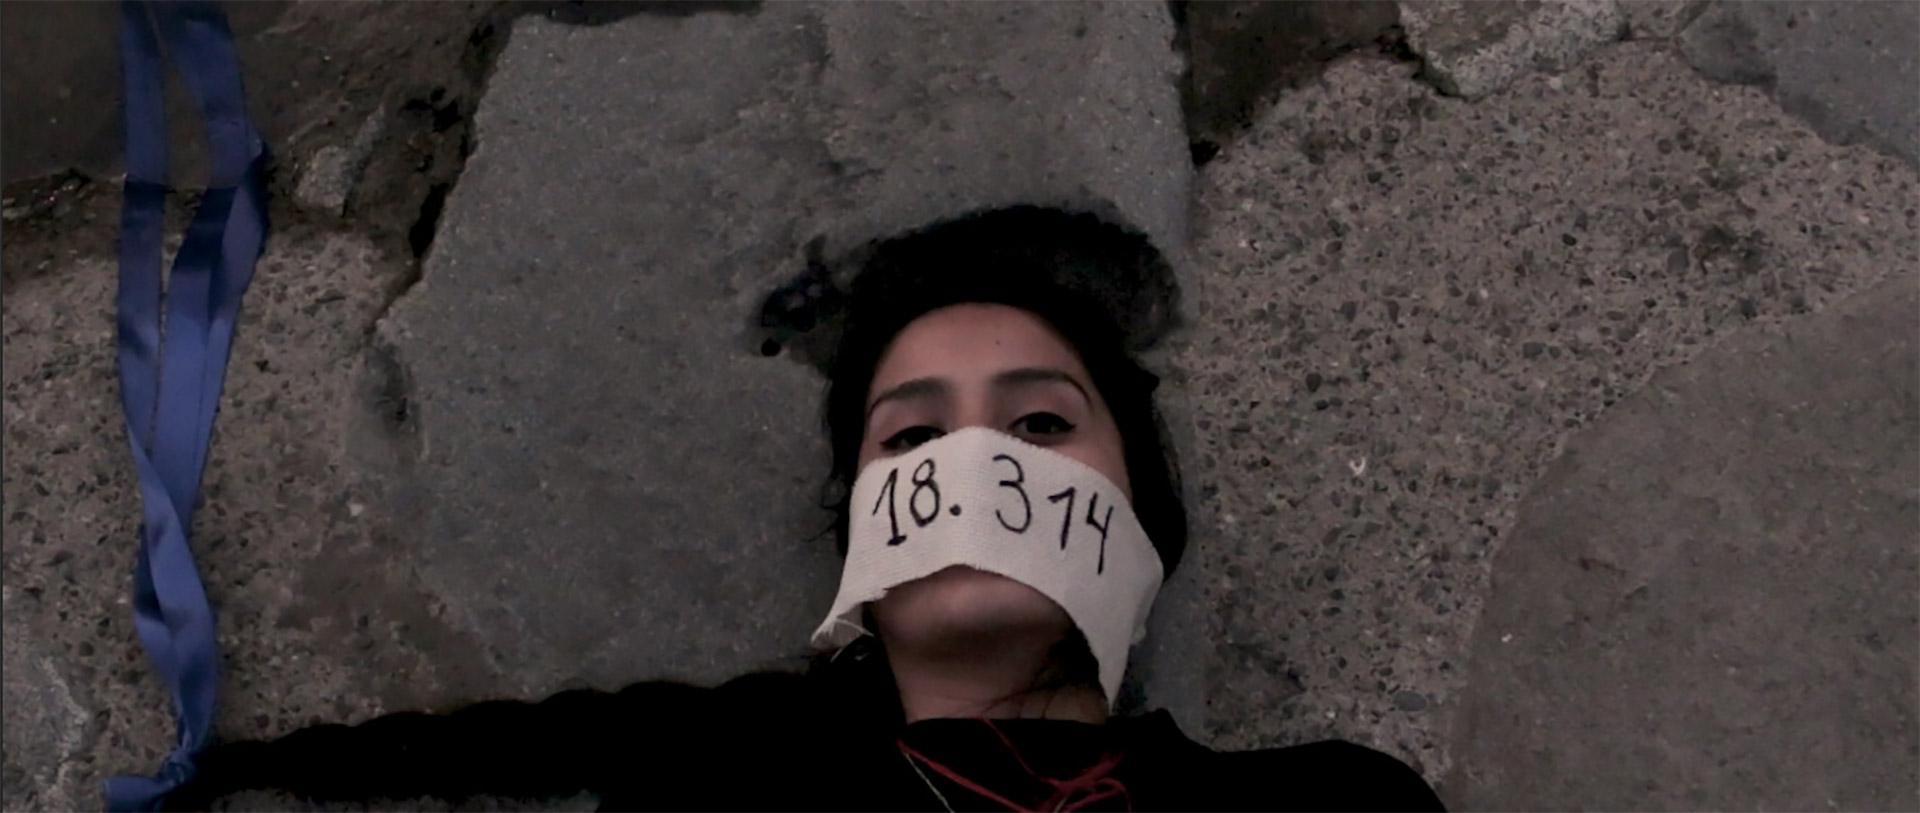 Intervention Mapuche – Oeuvre 18.314: Mari pura warangka küla pataka mari meli